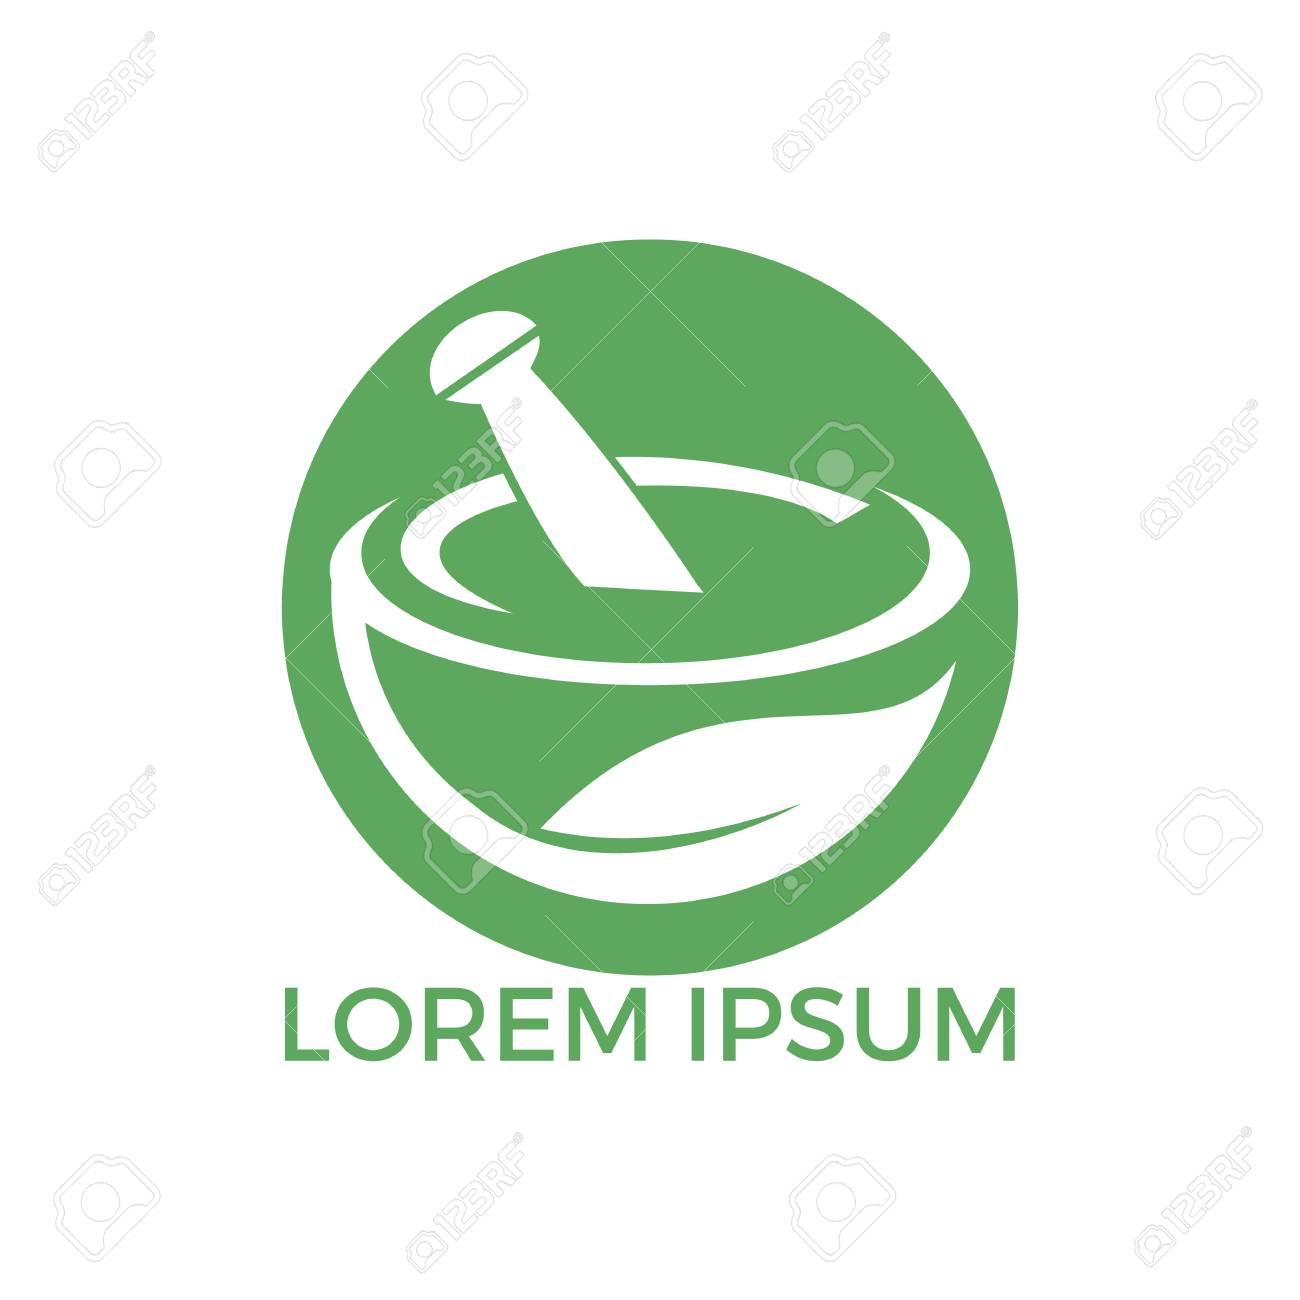 Pharmacy medical logo design. Natural mortar and pestle logotype, medicine herbal illustration symbol icon vector design. - 109947136